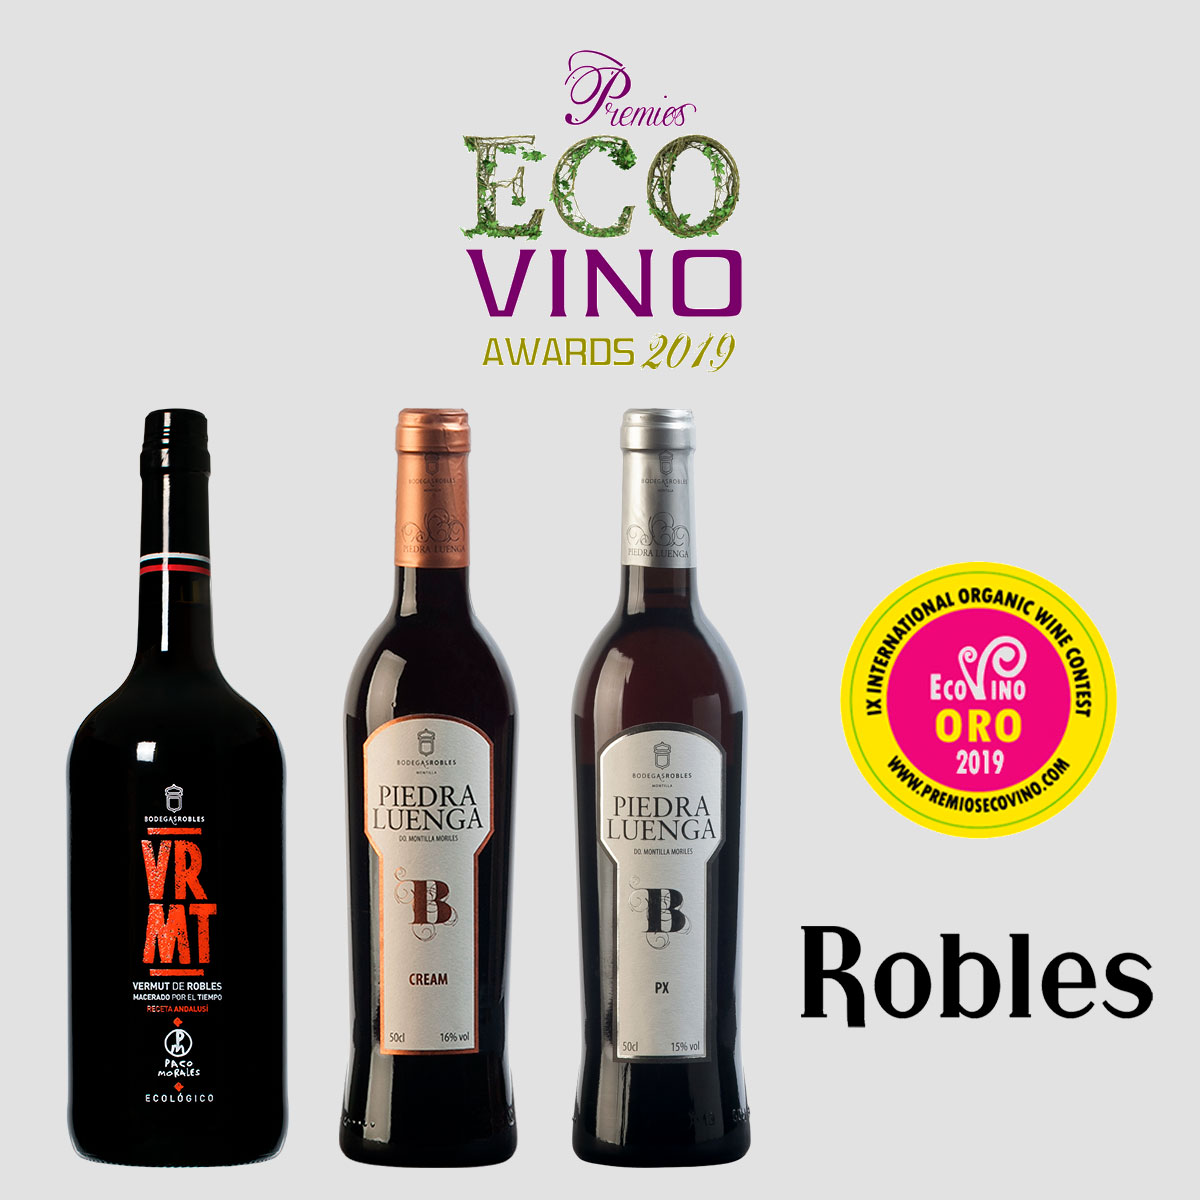 New recognition at Ecovino Awards (La Rioja, Spain)